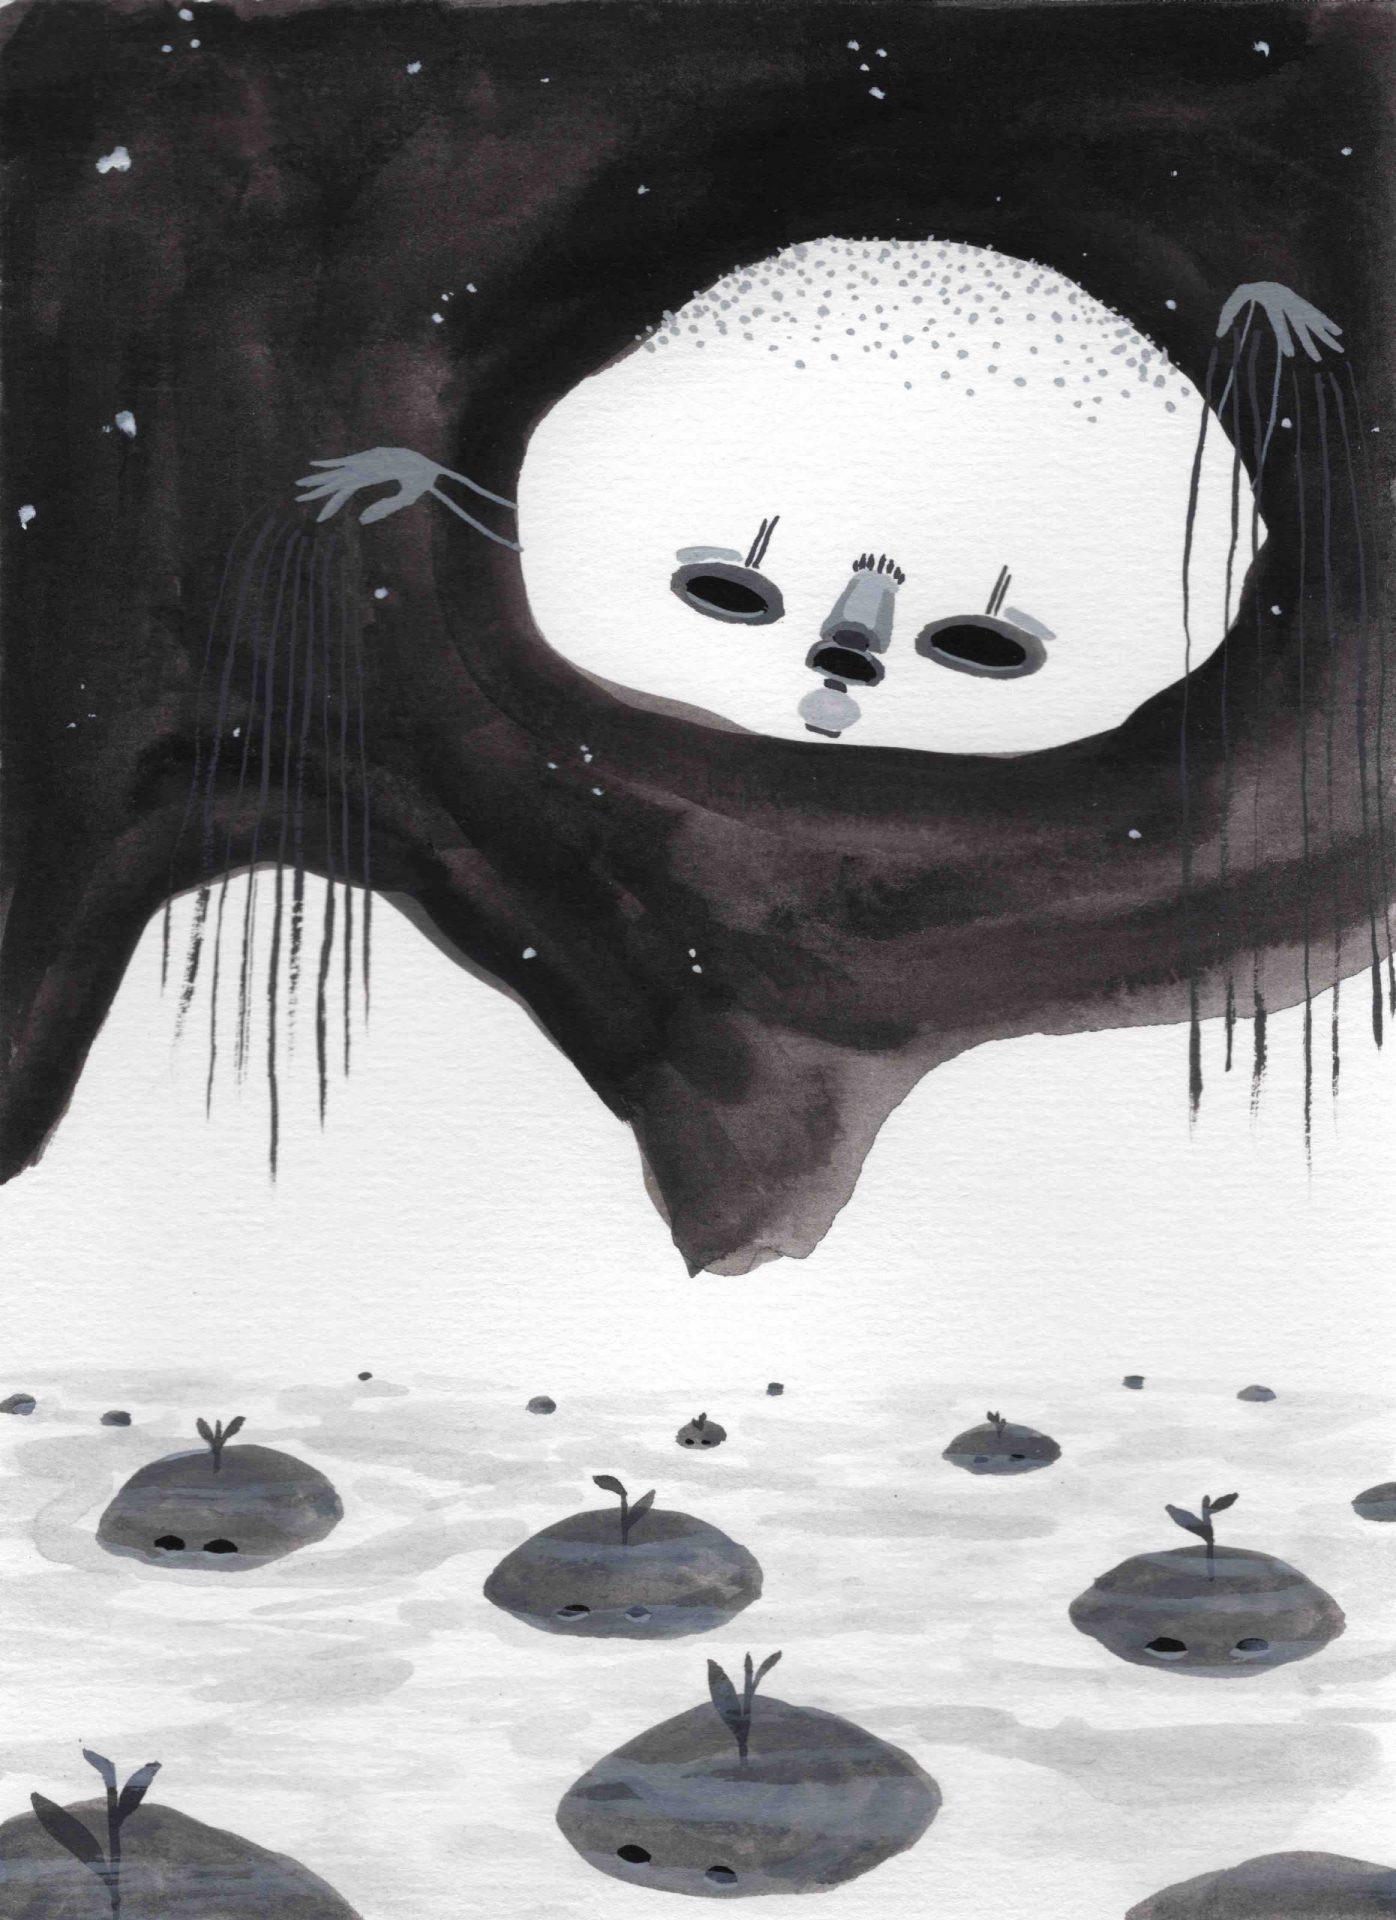 """Cultivo"" (2020) 14 x 19 cm. Acrylic gouache on paper."